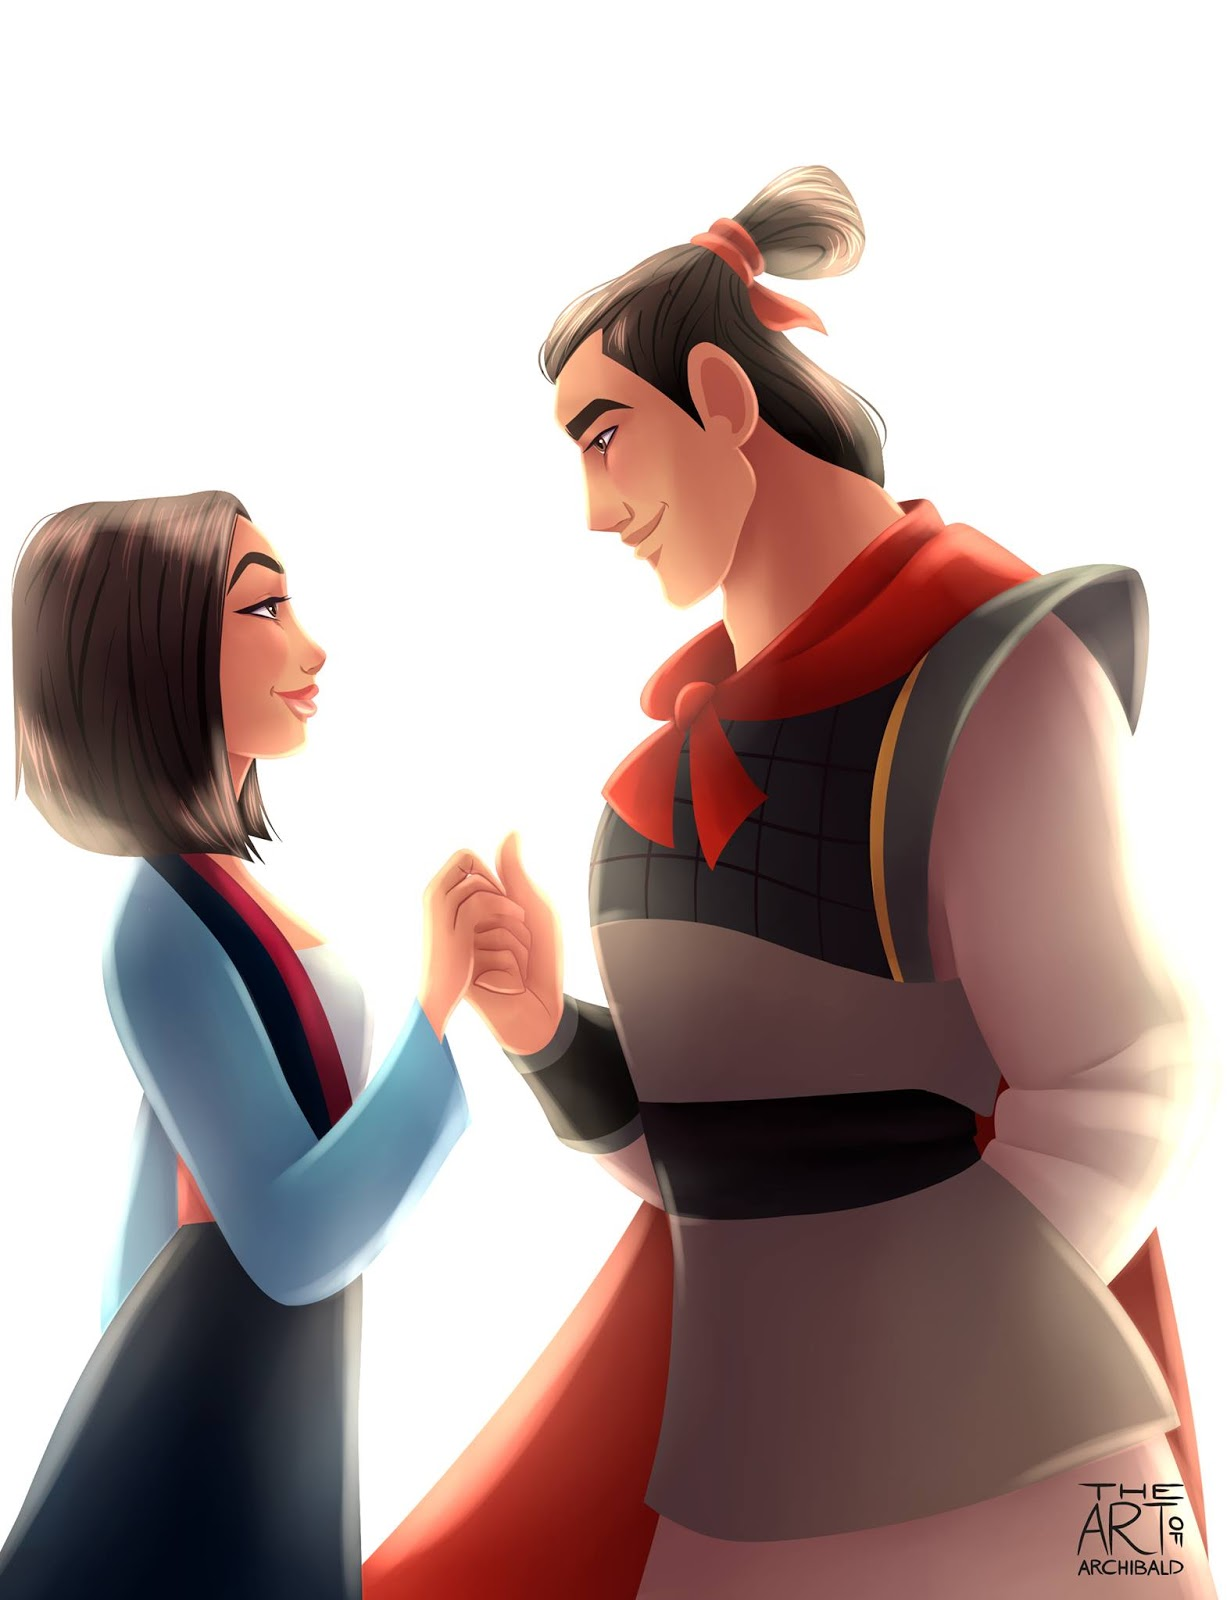 Disney cast os casais disney de archibald parte 1 como por exemplo mulan e shang que fofos eles ficaram nesta fanart adorei fandeluxe Gallery